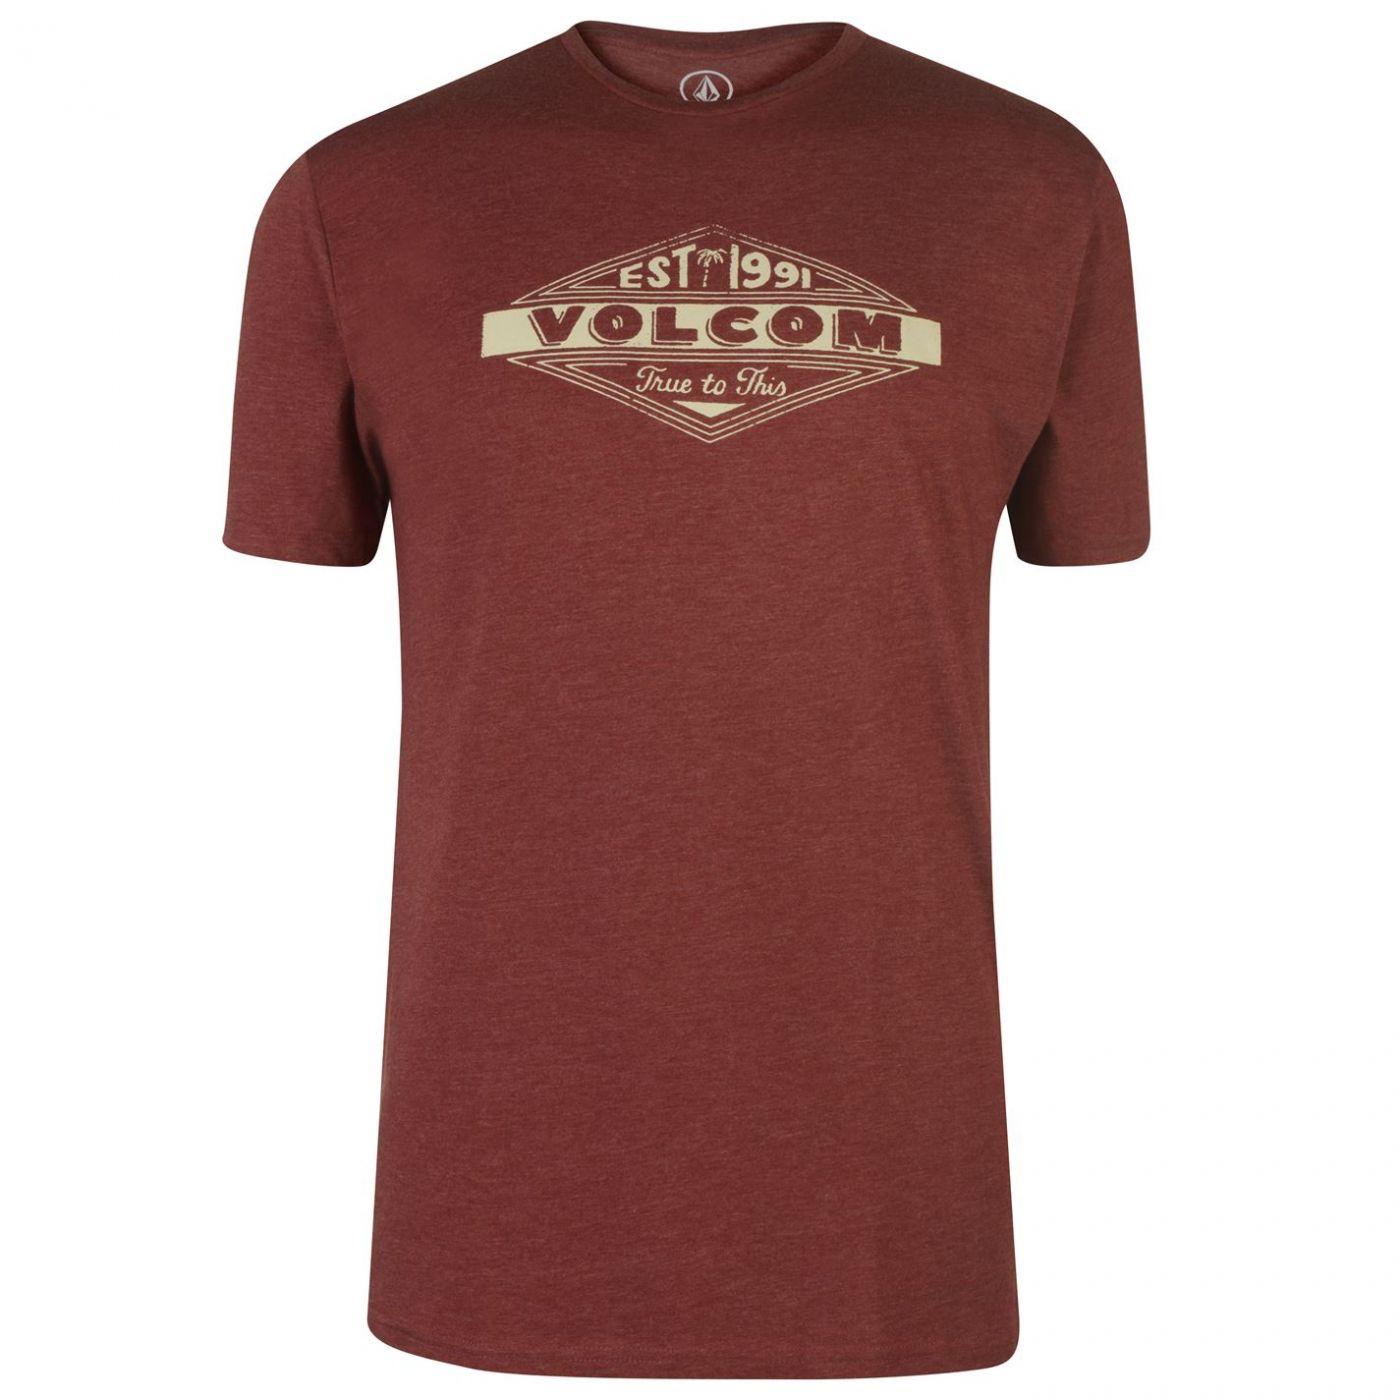 Volcom Mens Printed T-shirt